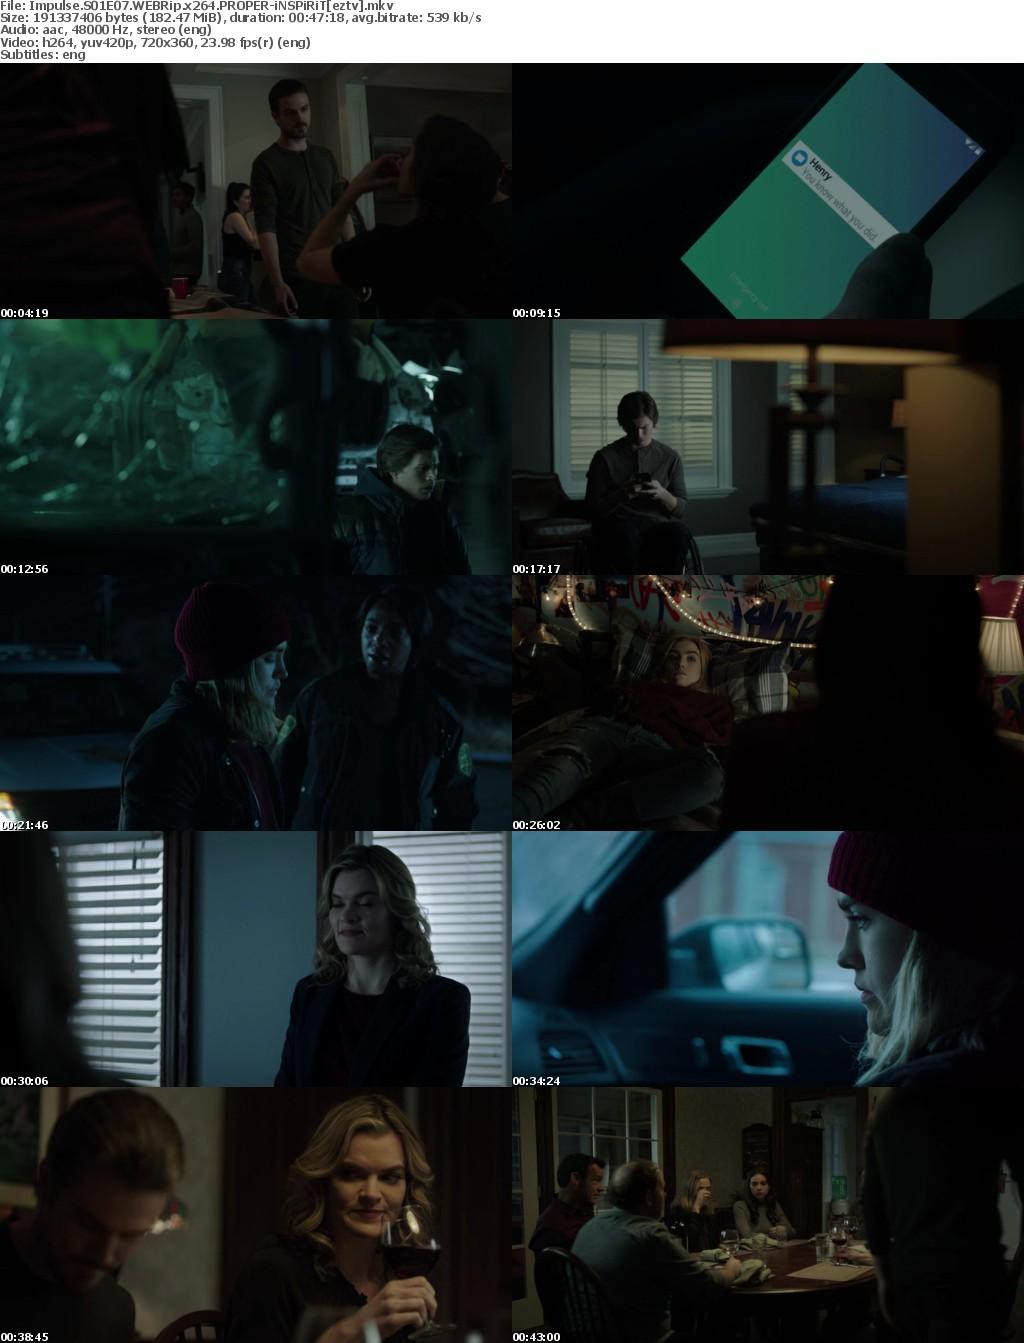 Impulse S01E07 WEBRip x264 PROPER-iNSPiRiT